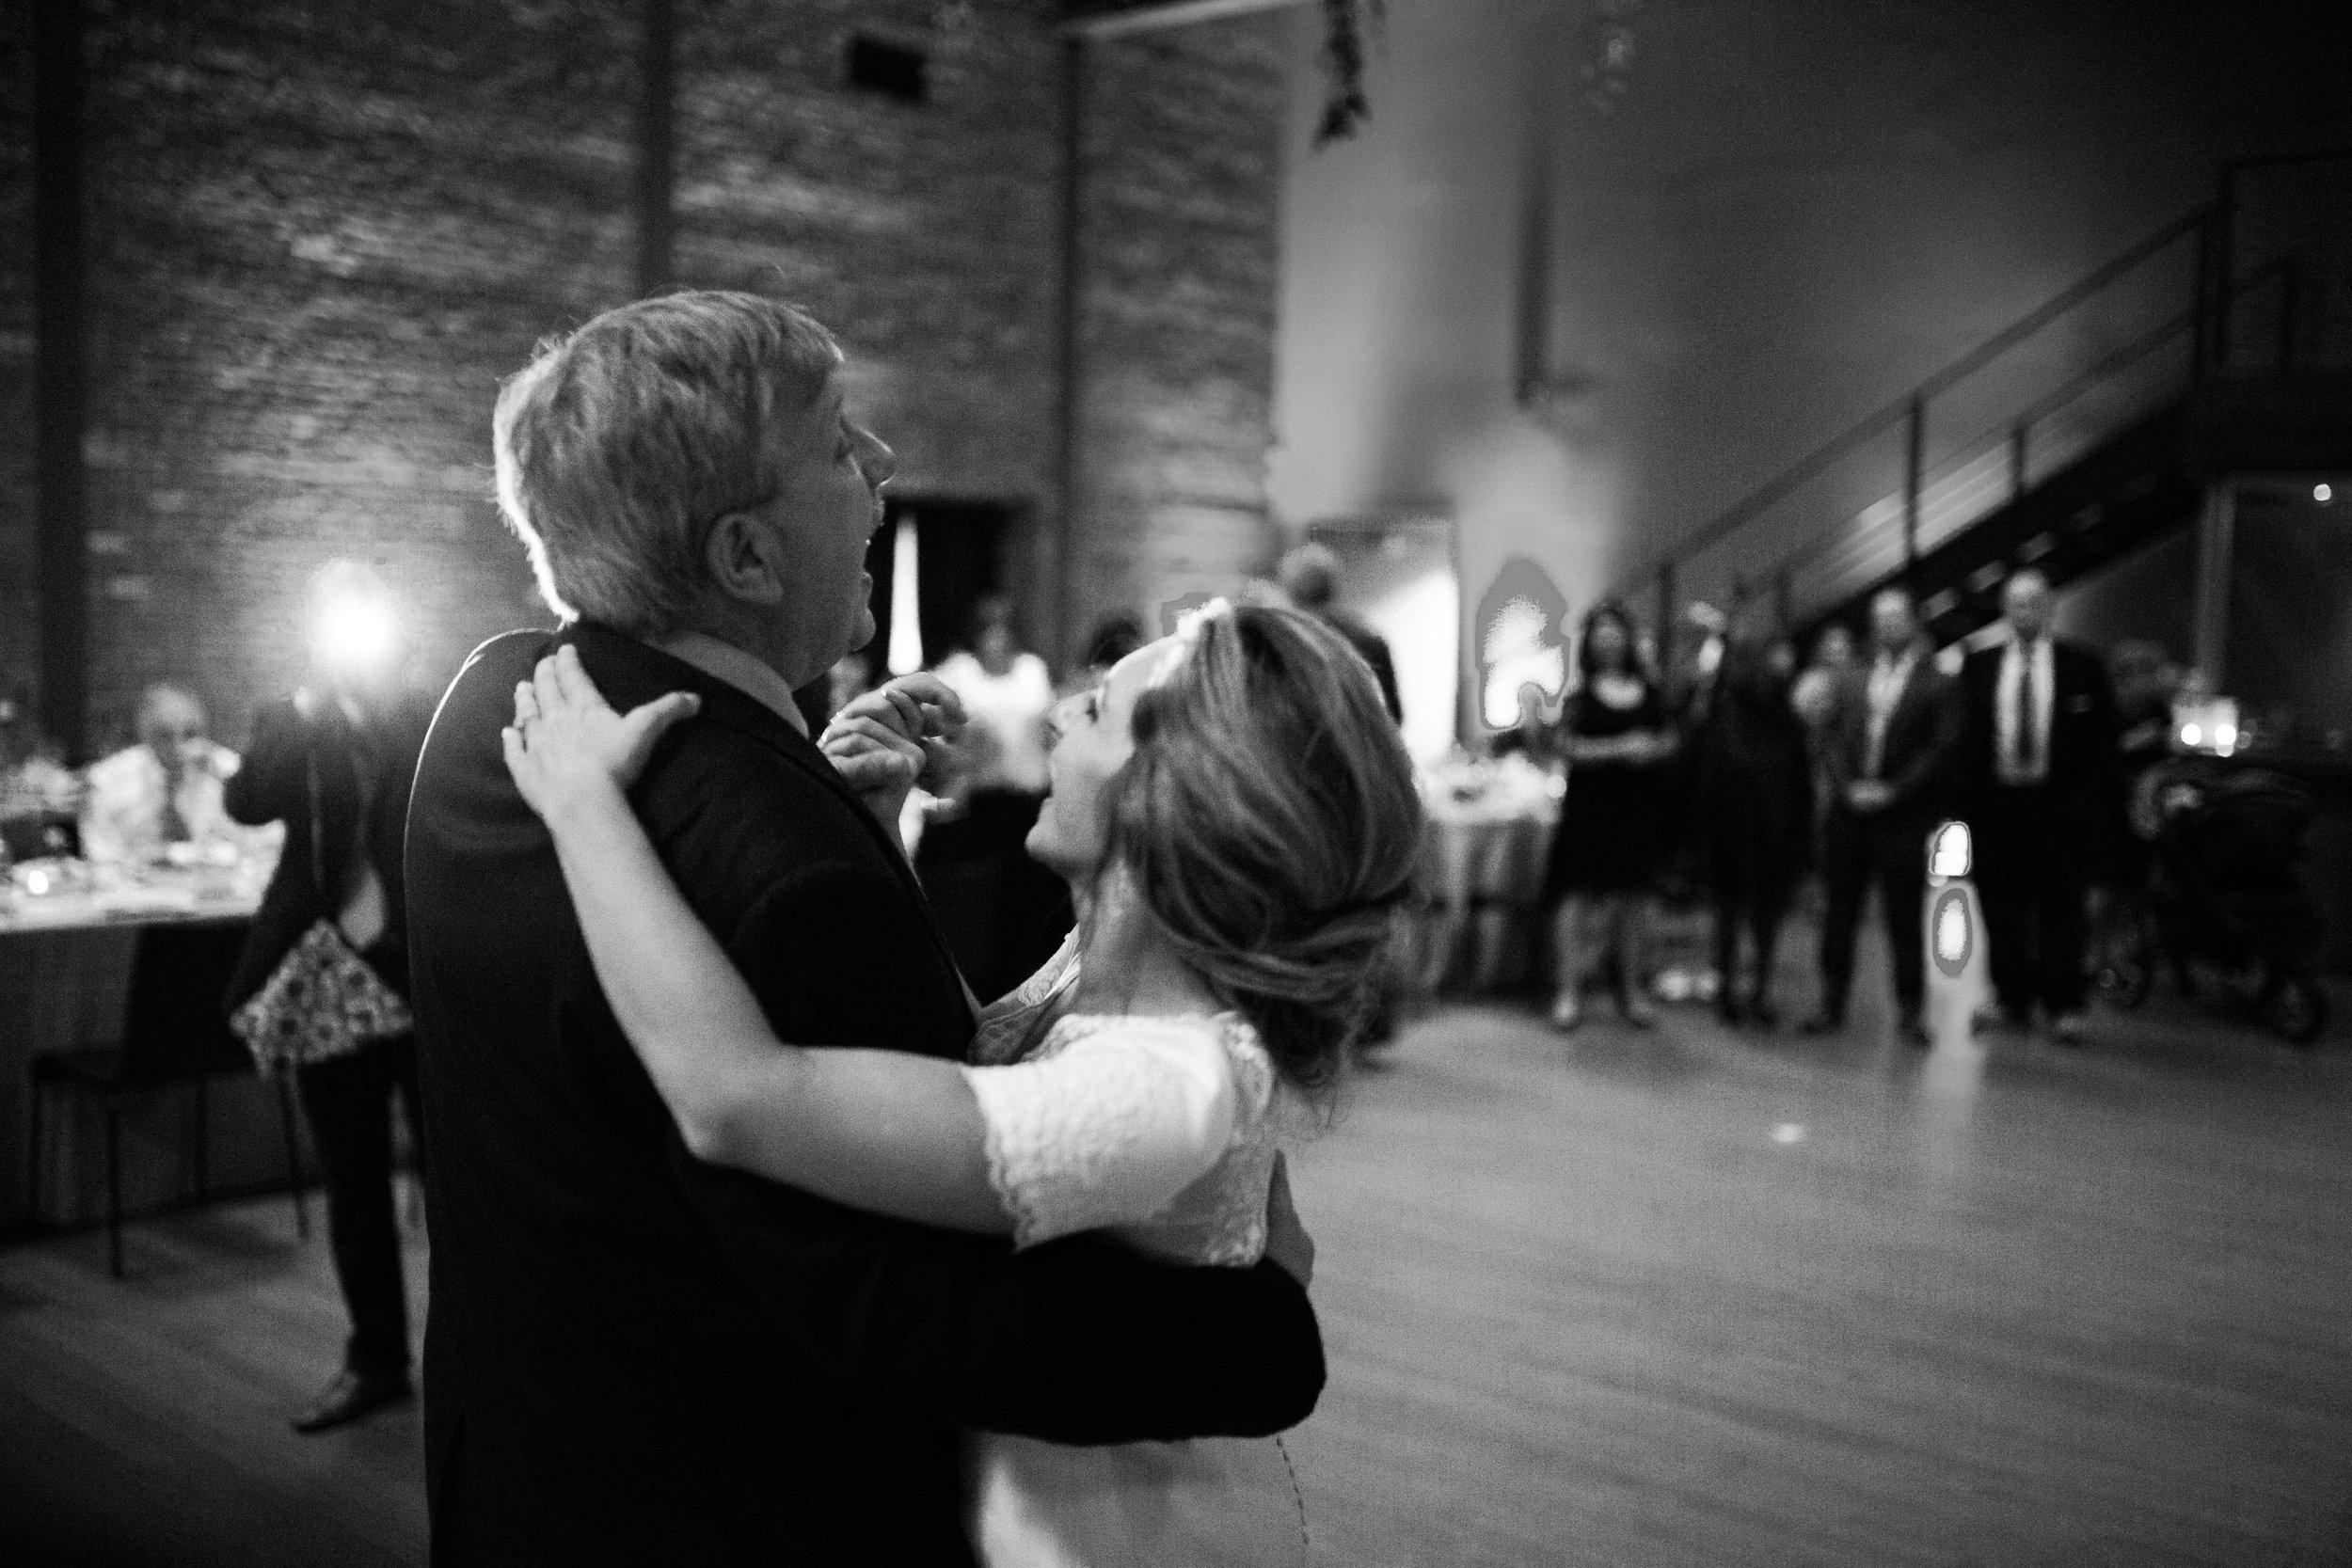 HiloandGinger-Brian+Dina_Weddingday_SneakPeek-65.jpg